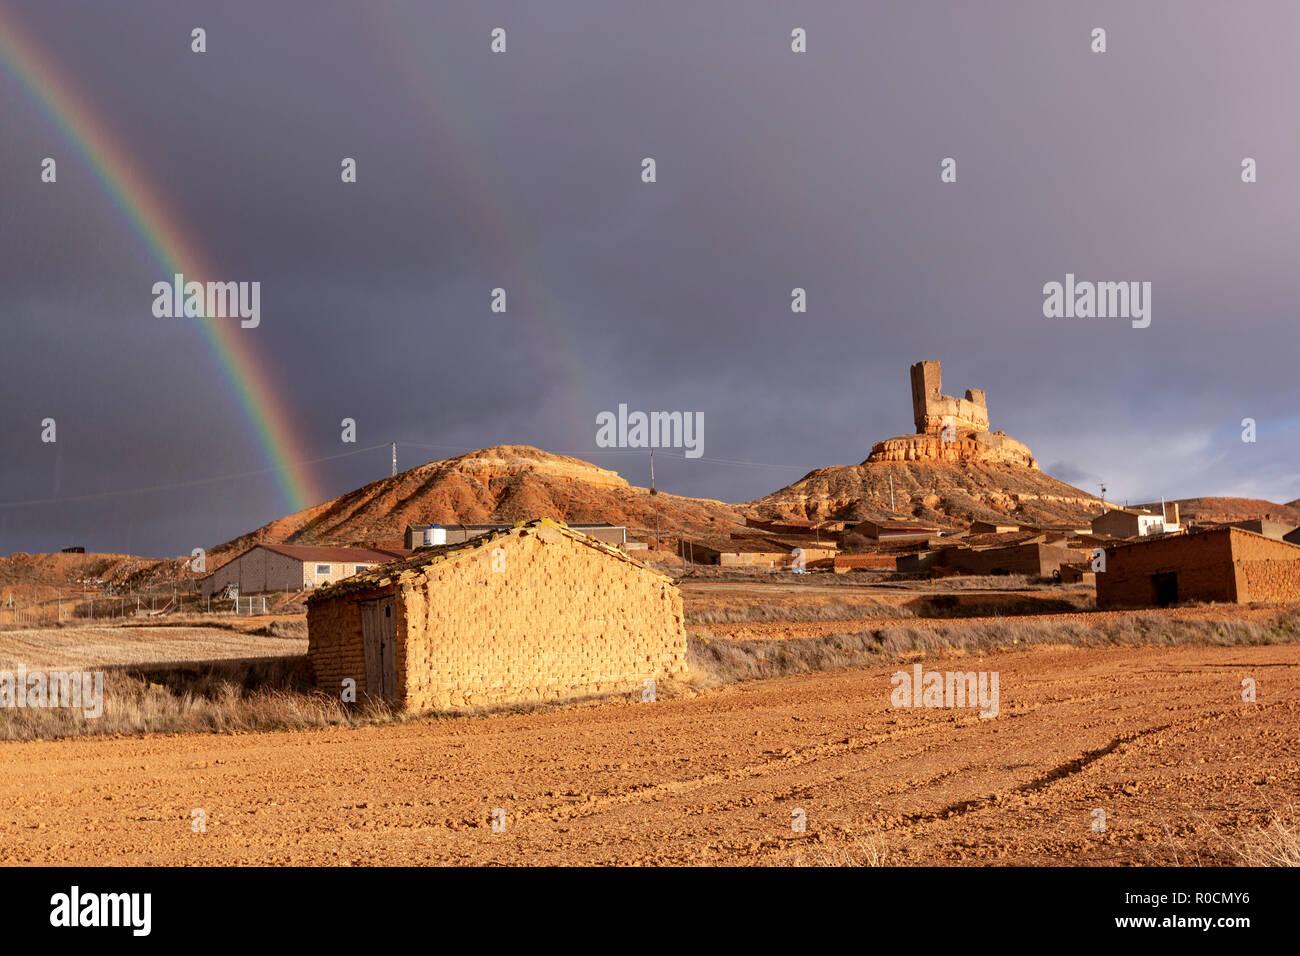 rainbow-over-a-rural-castilian-village-w